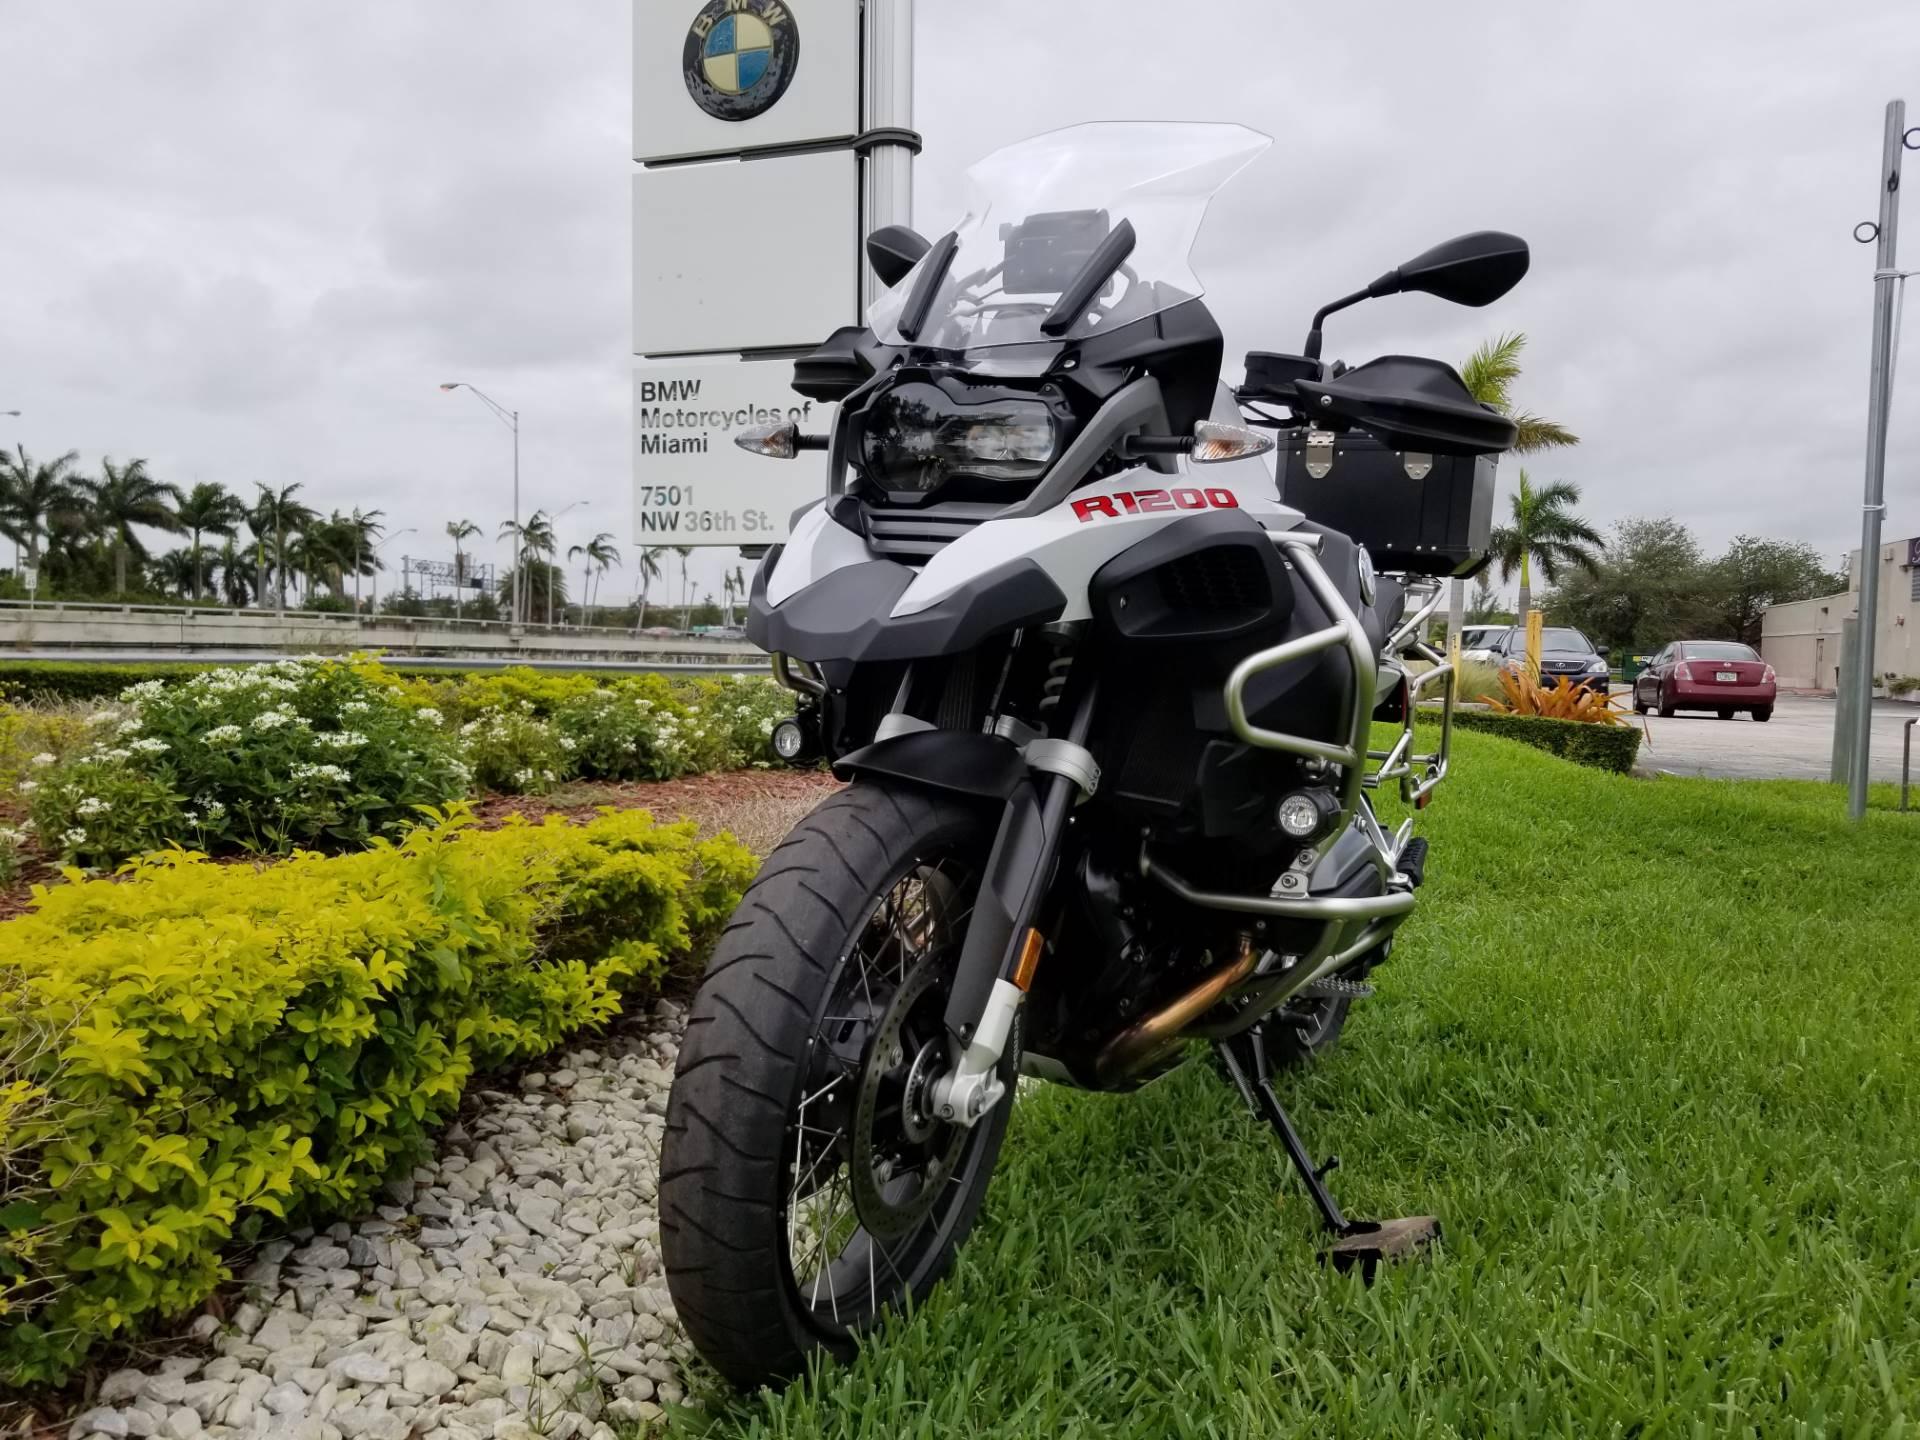 2016 R 1200 GS Adventure